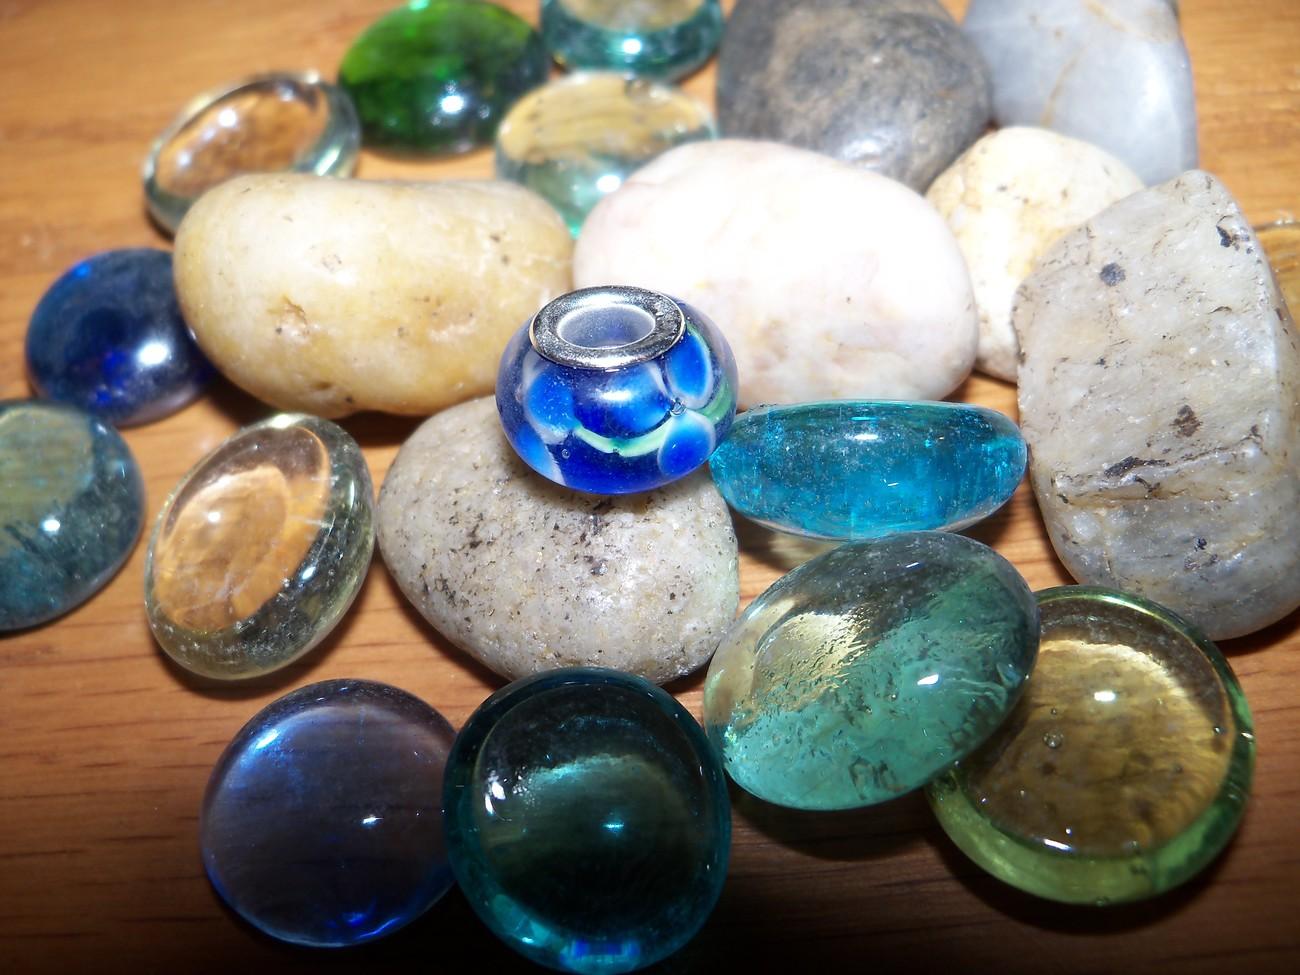 HAUNTED bead money DARK ifrit djinn PROTECTION REVENGE love money wealth wish 4U - $26.67